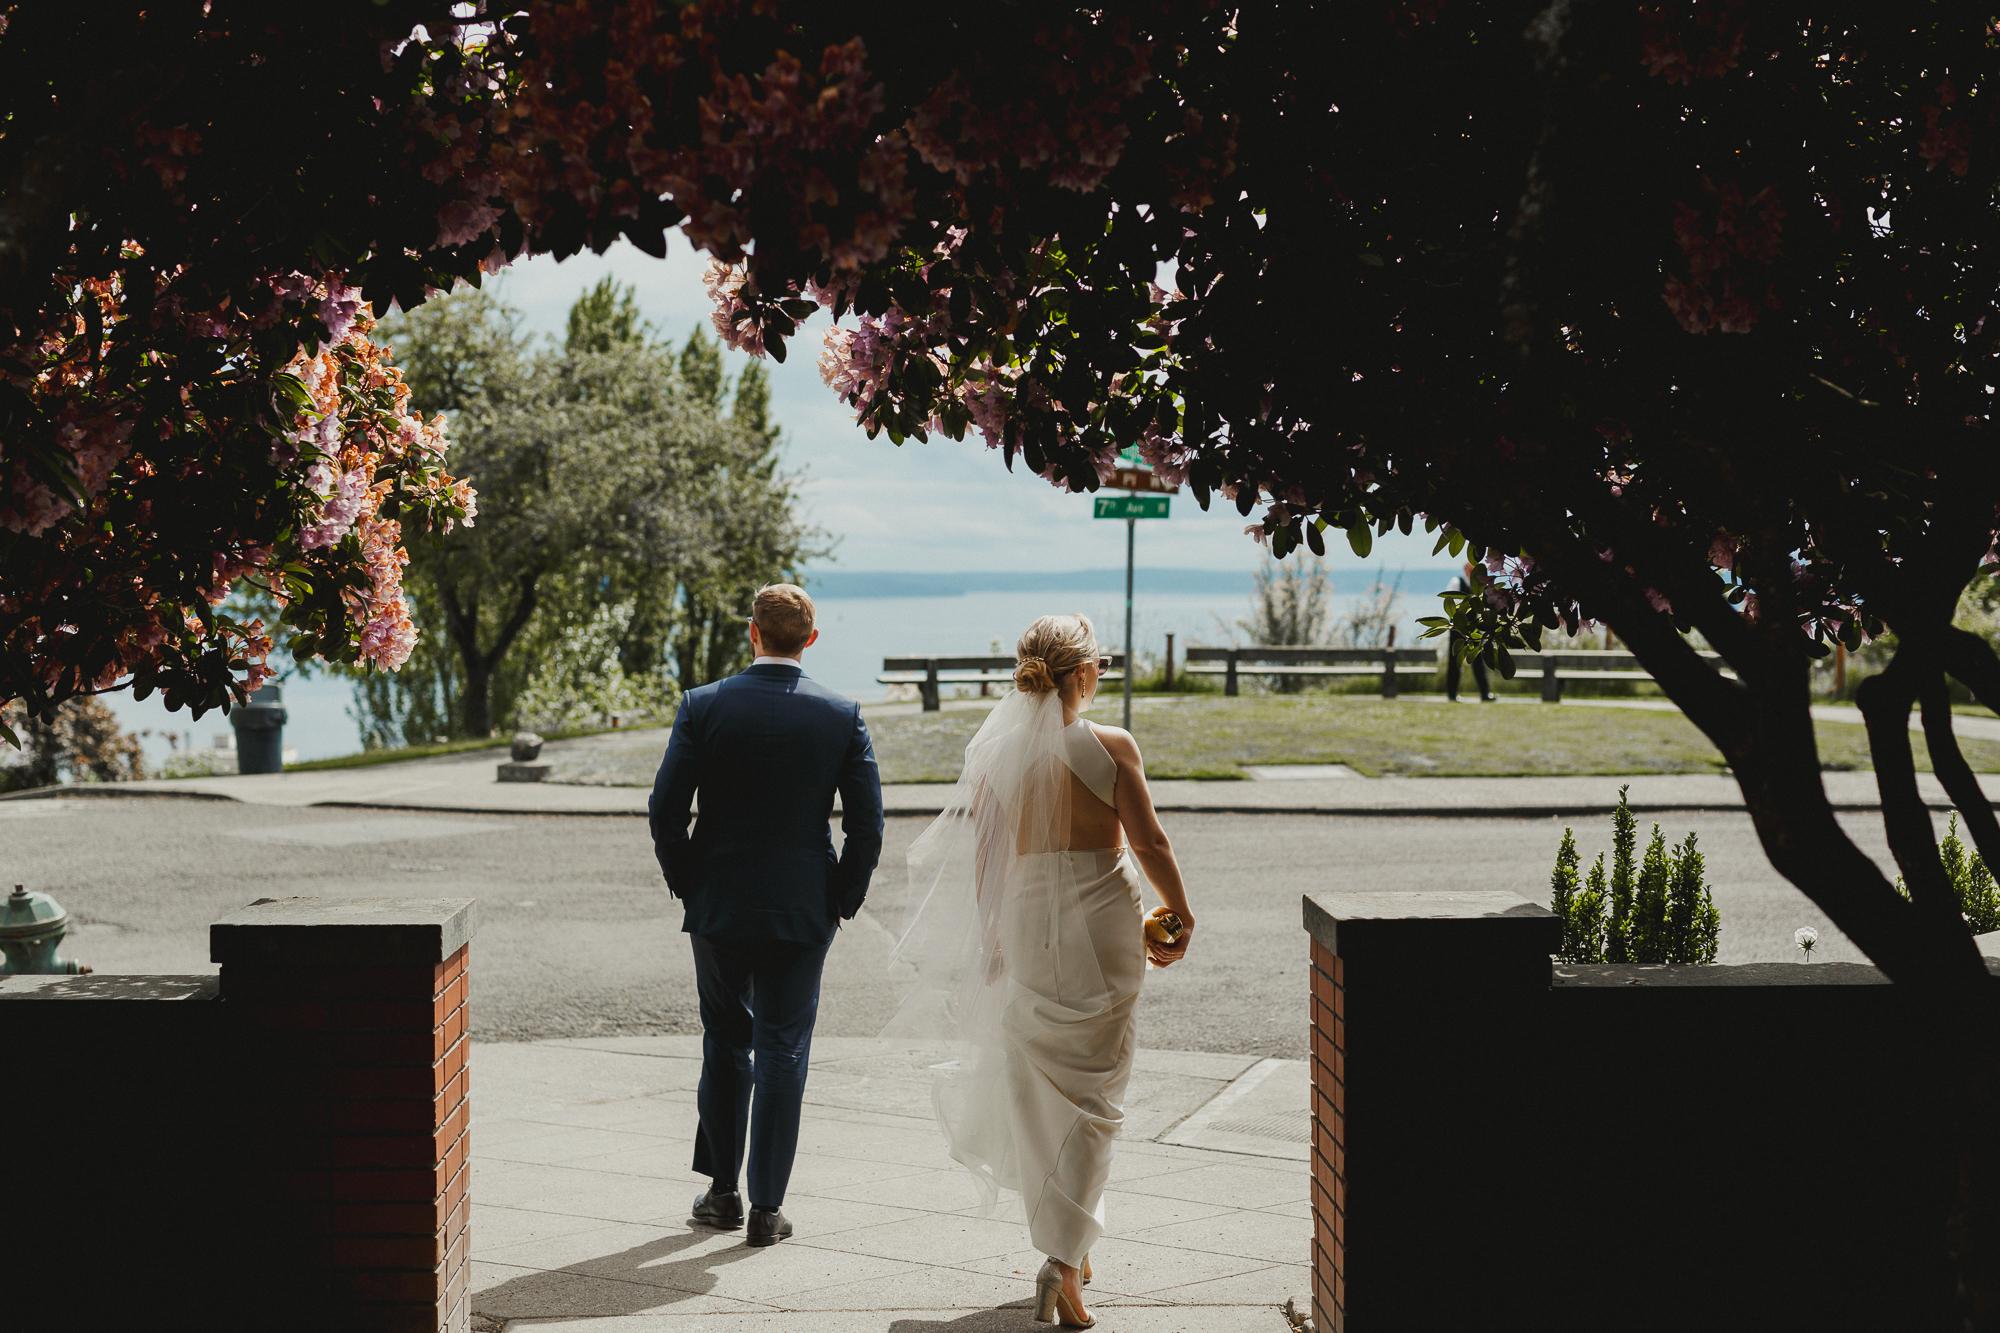 canlis restaurant wedding photos by Krista Welch-0031.jpg